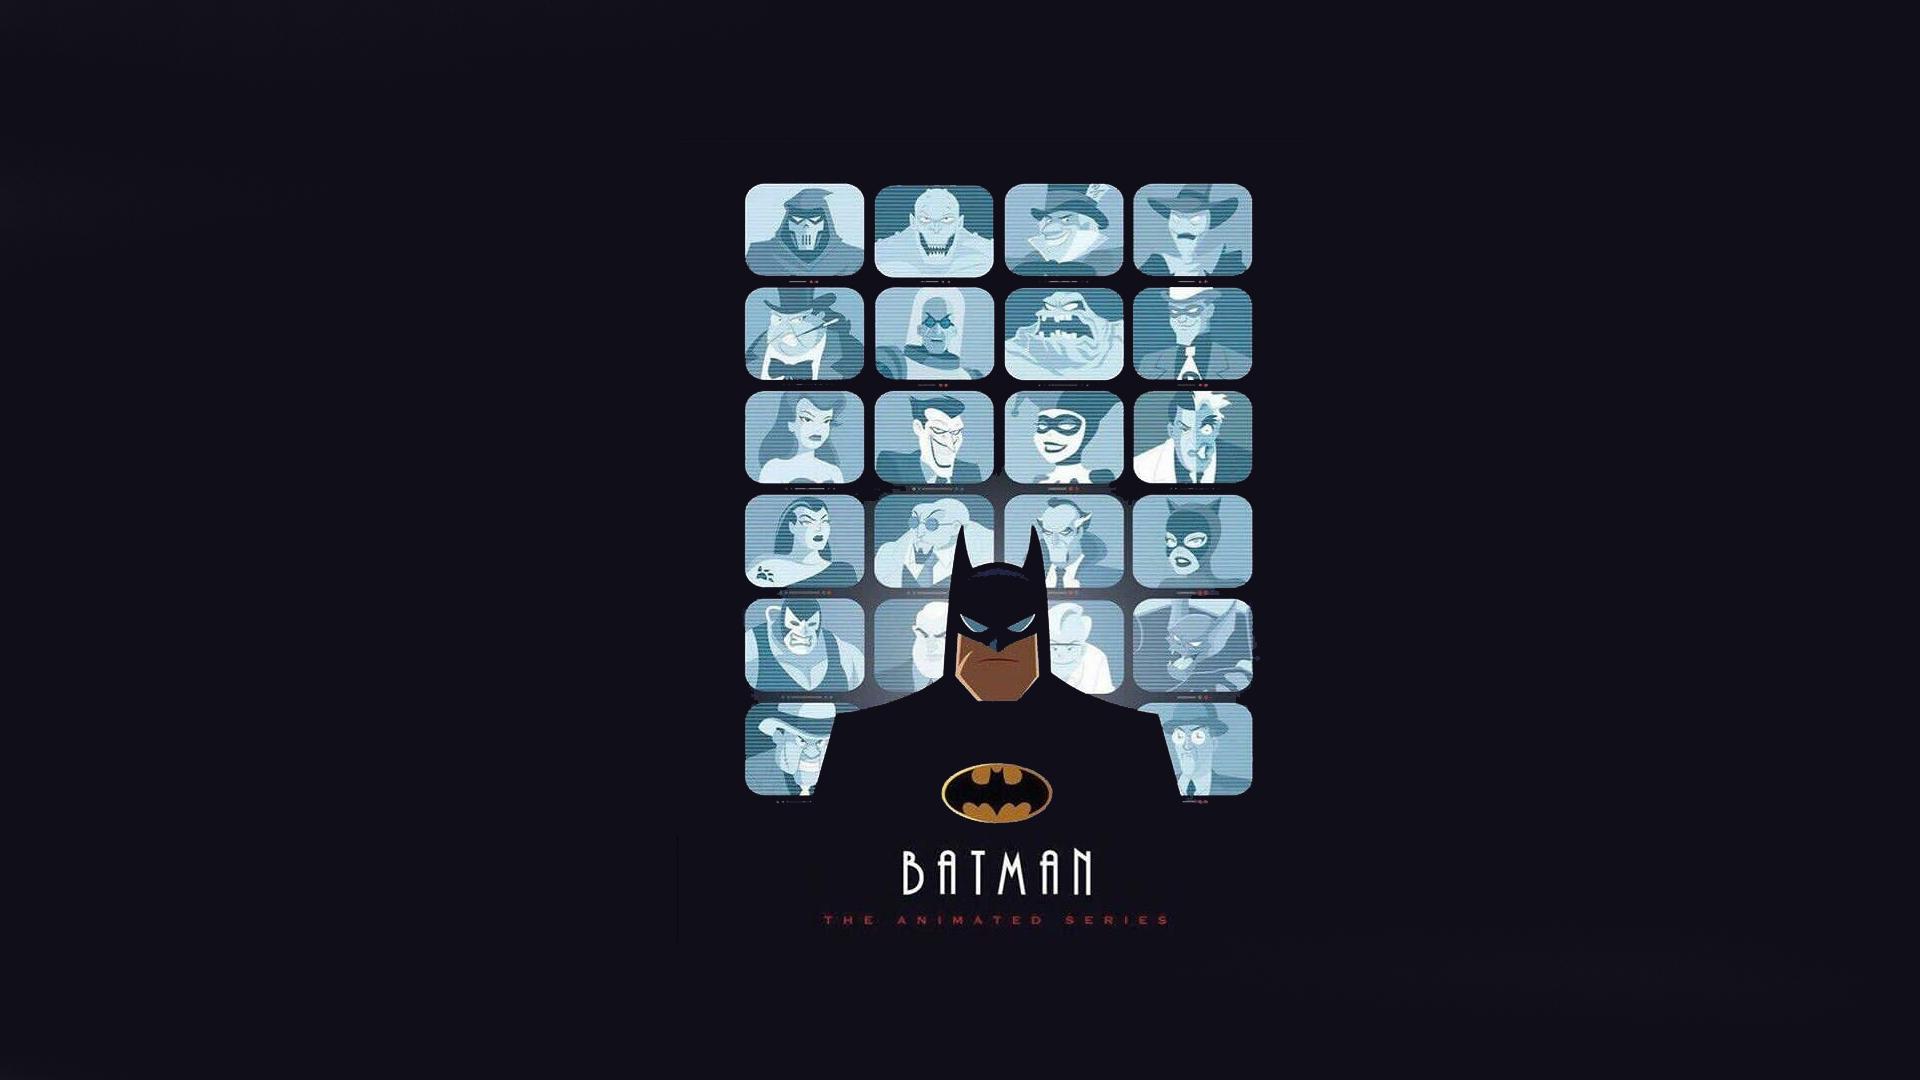 Wallpaper Batman The Animated Series Dc Comics 1920x1080